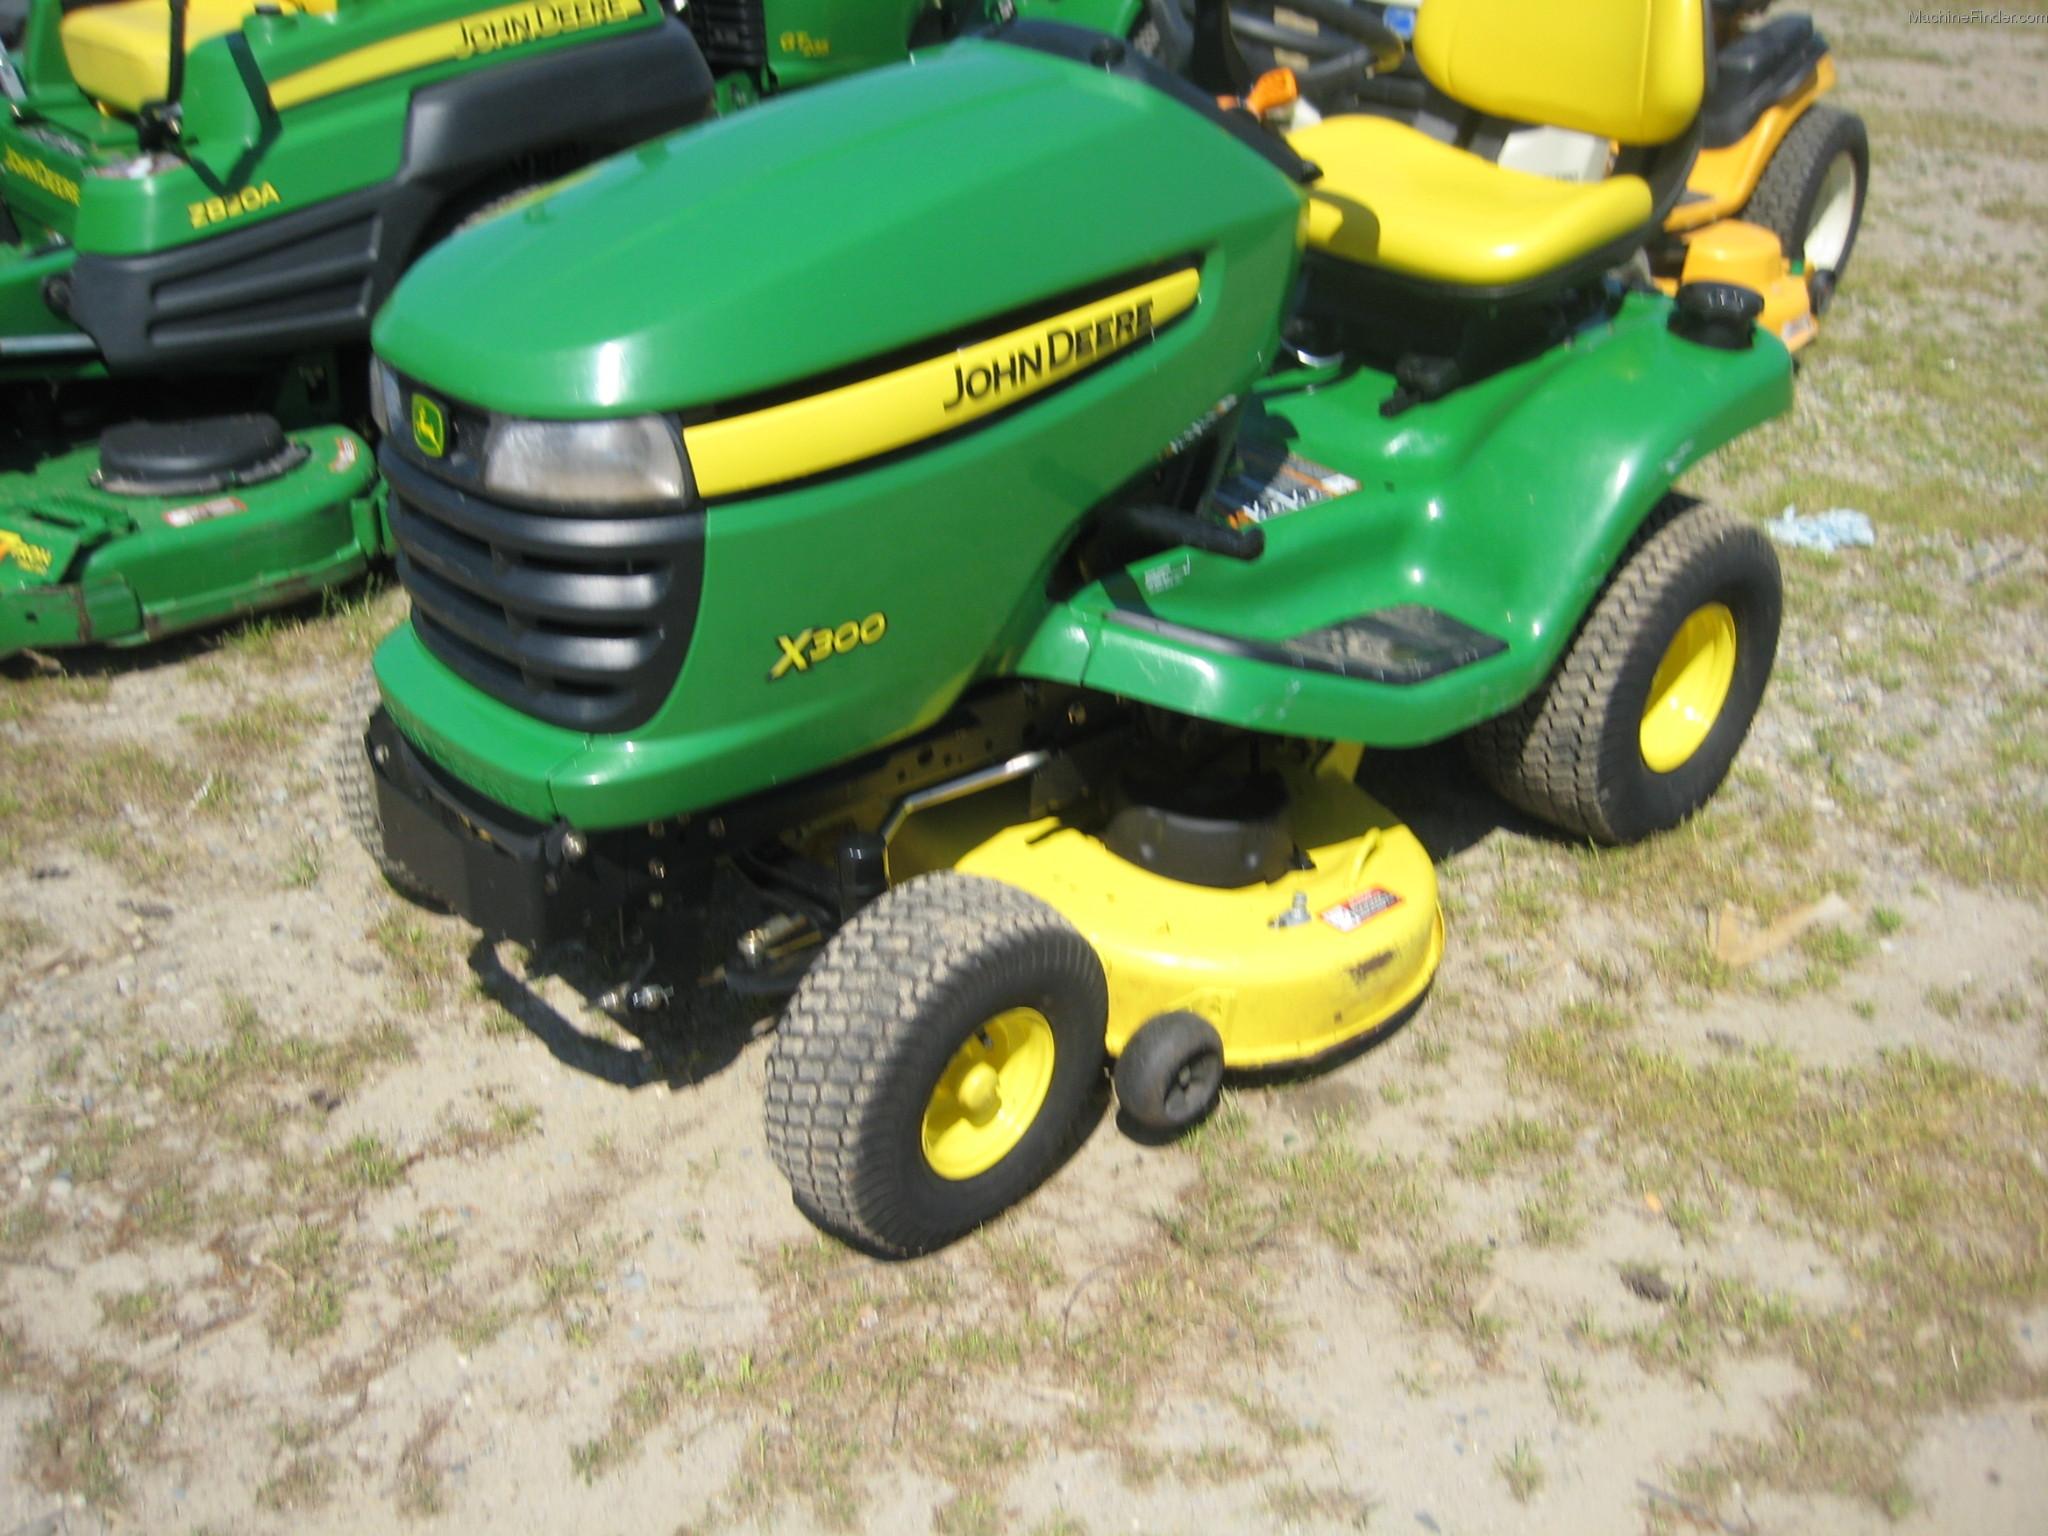 2010 john deere x300 lawn  garden and commercial mowing